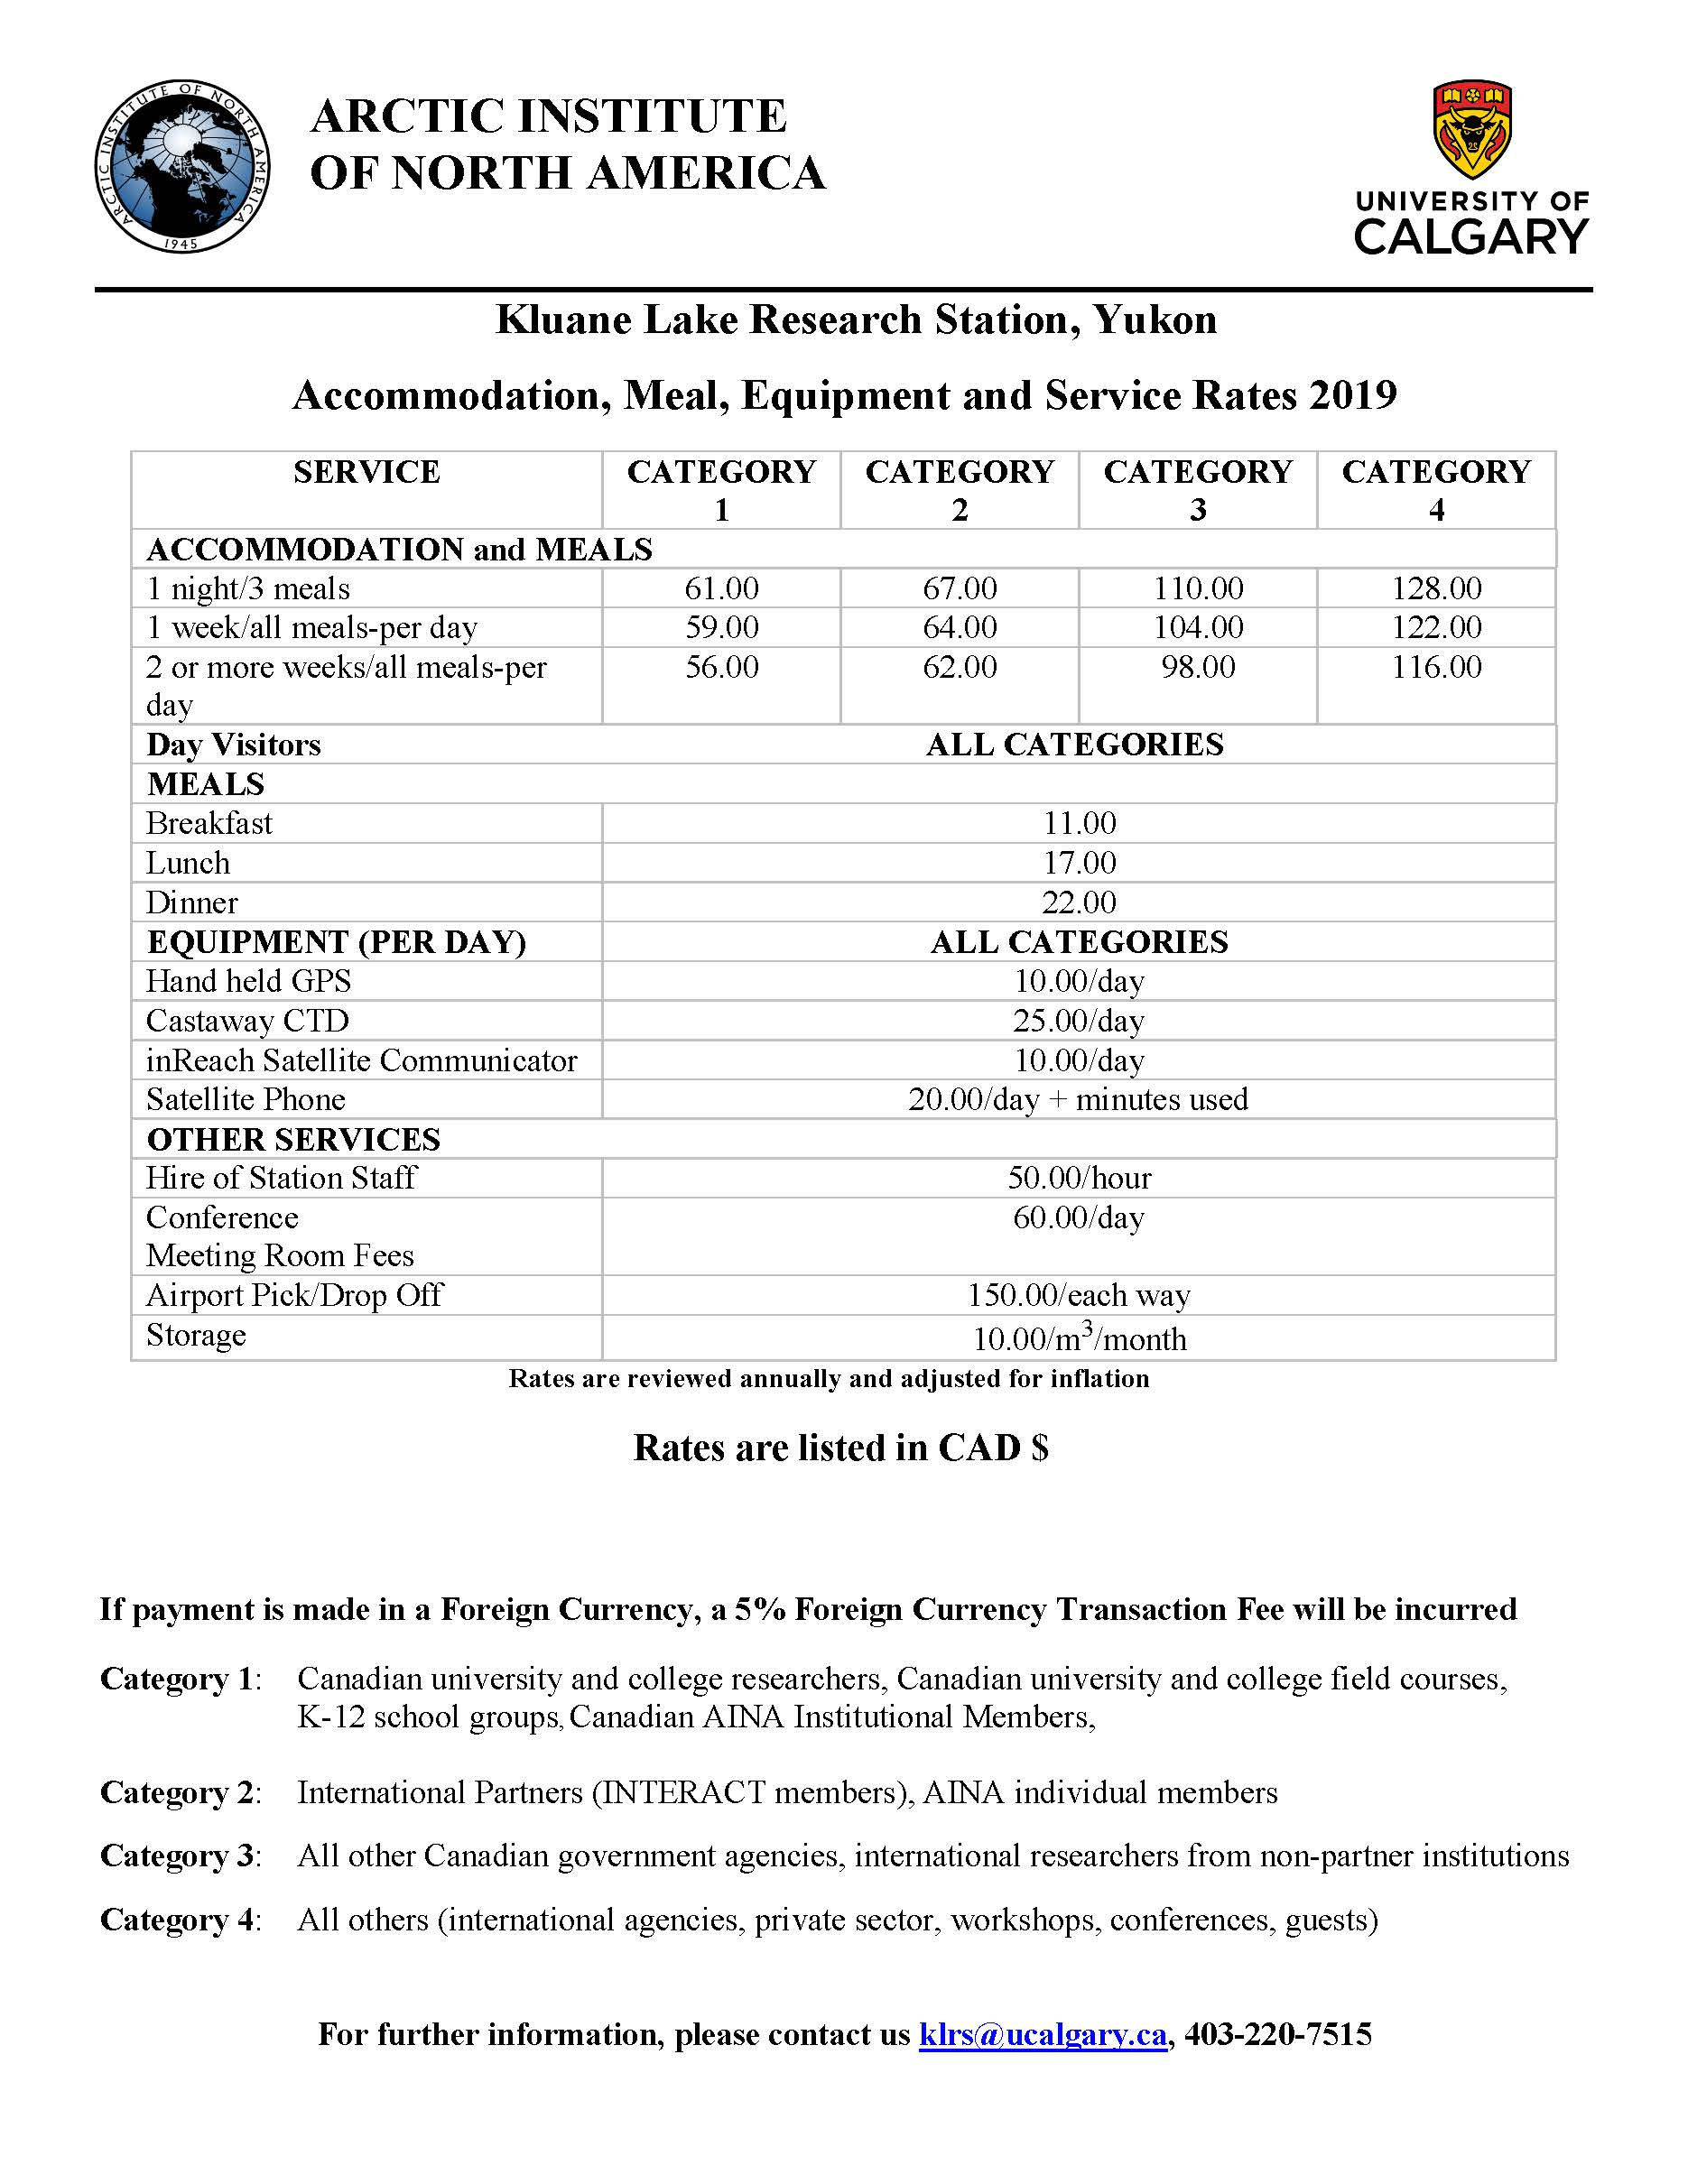 Kluane Lake Research Station Rates 2019